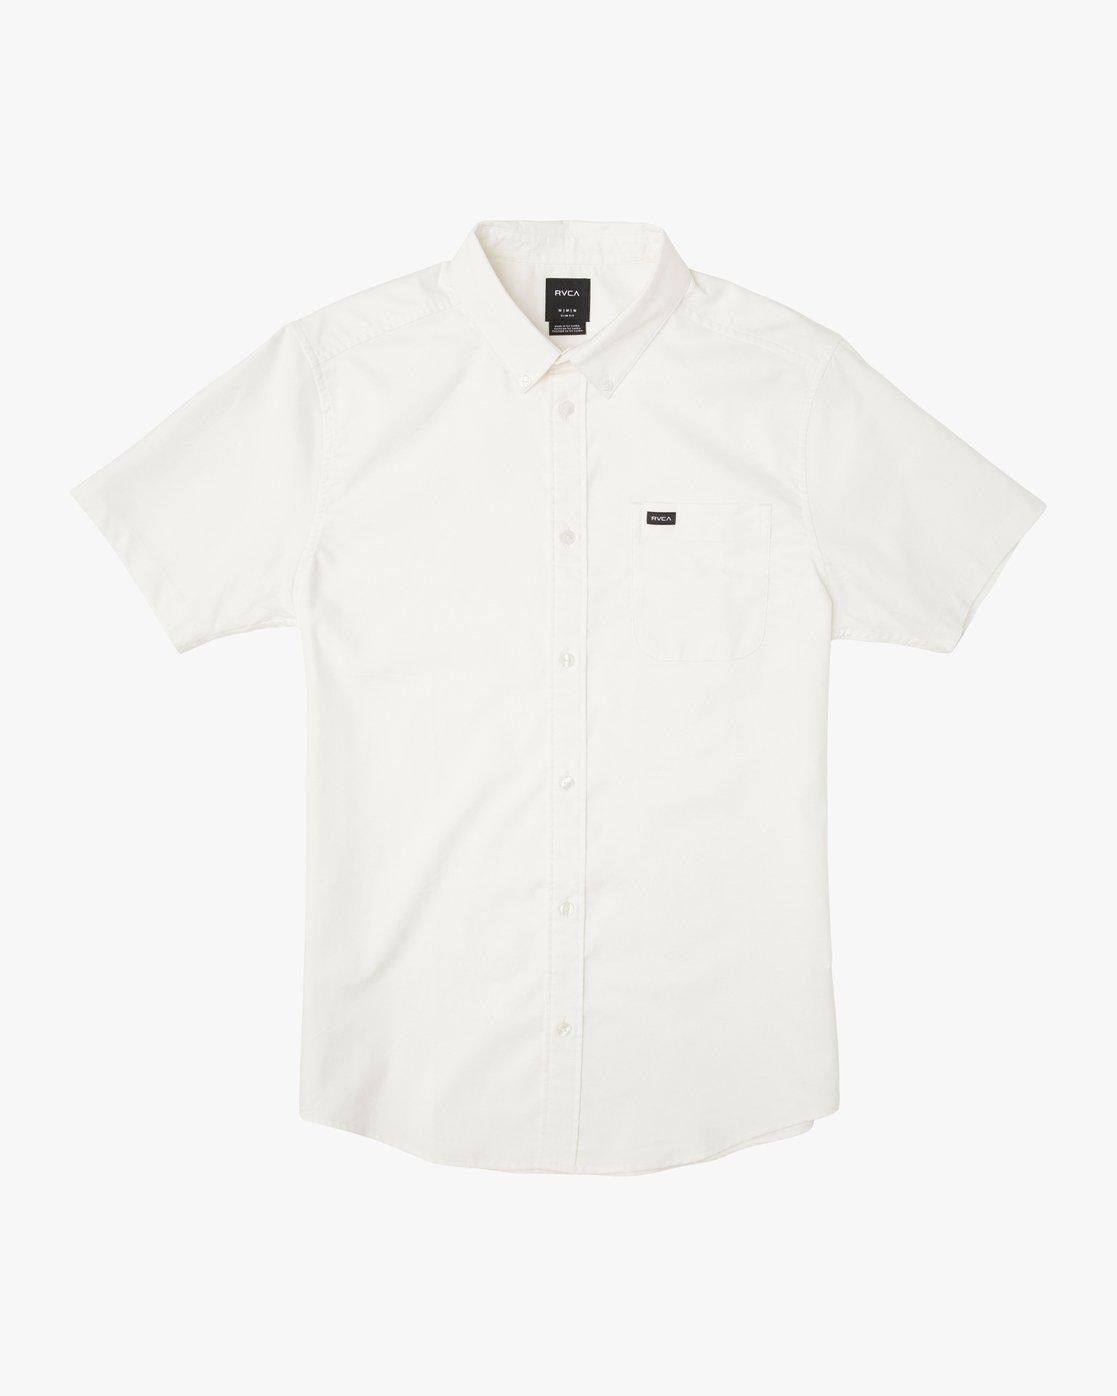 0 That'll Do Stretch Short Sleeve Shirt White MK515TDS RVCA